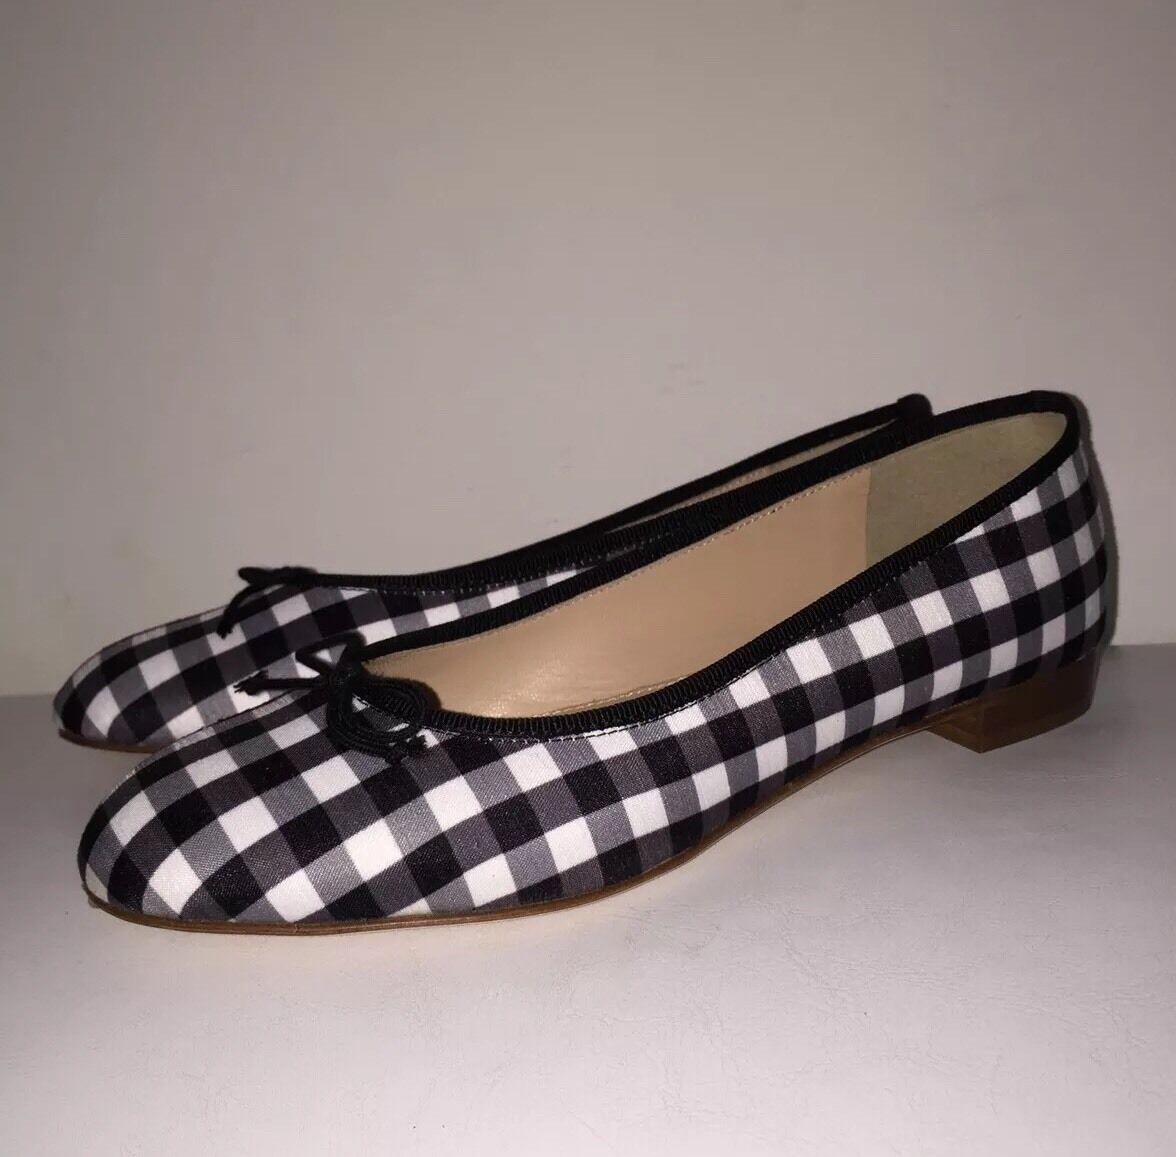 JCREW Kiki ballet flats in gingham 6 shoes black white shoes e8462